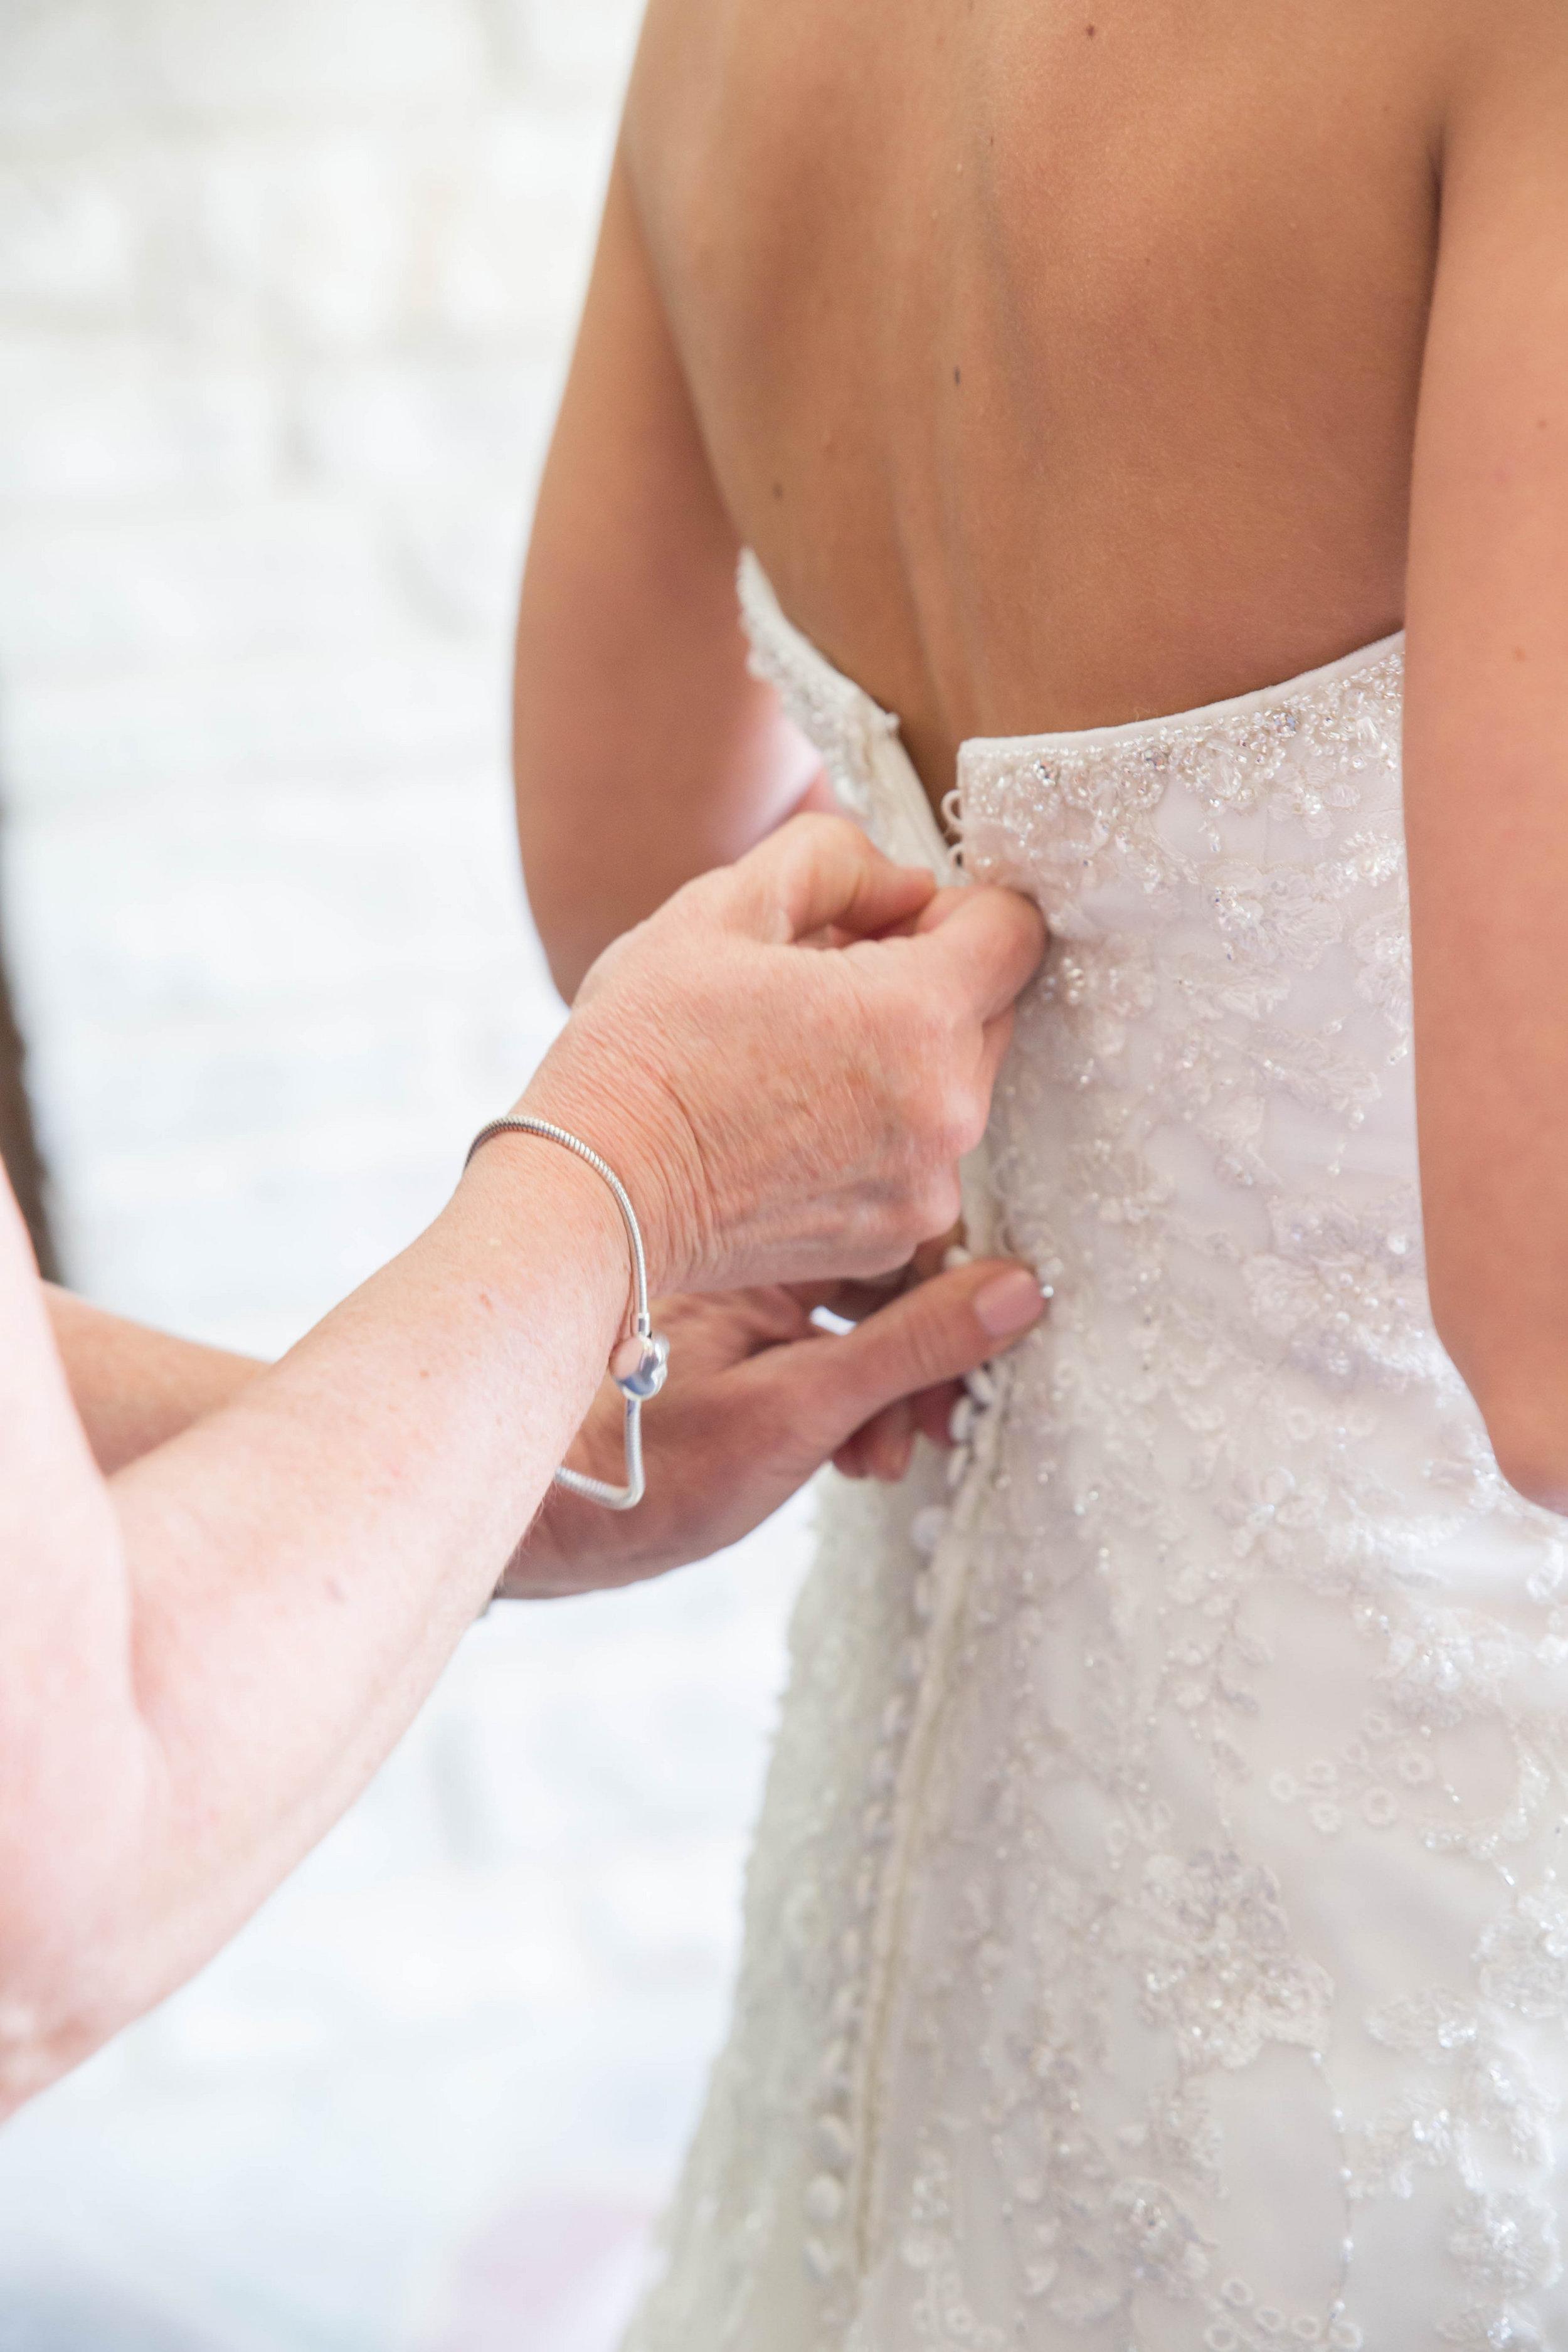 Donelson Wedding-Donelson-0035.jpg